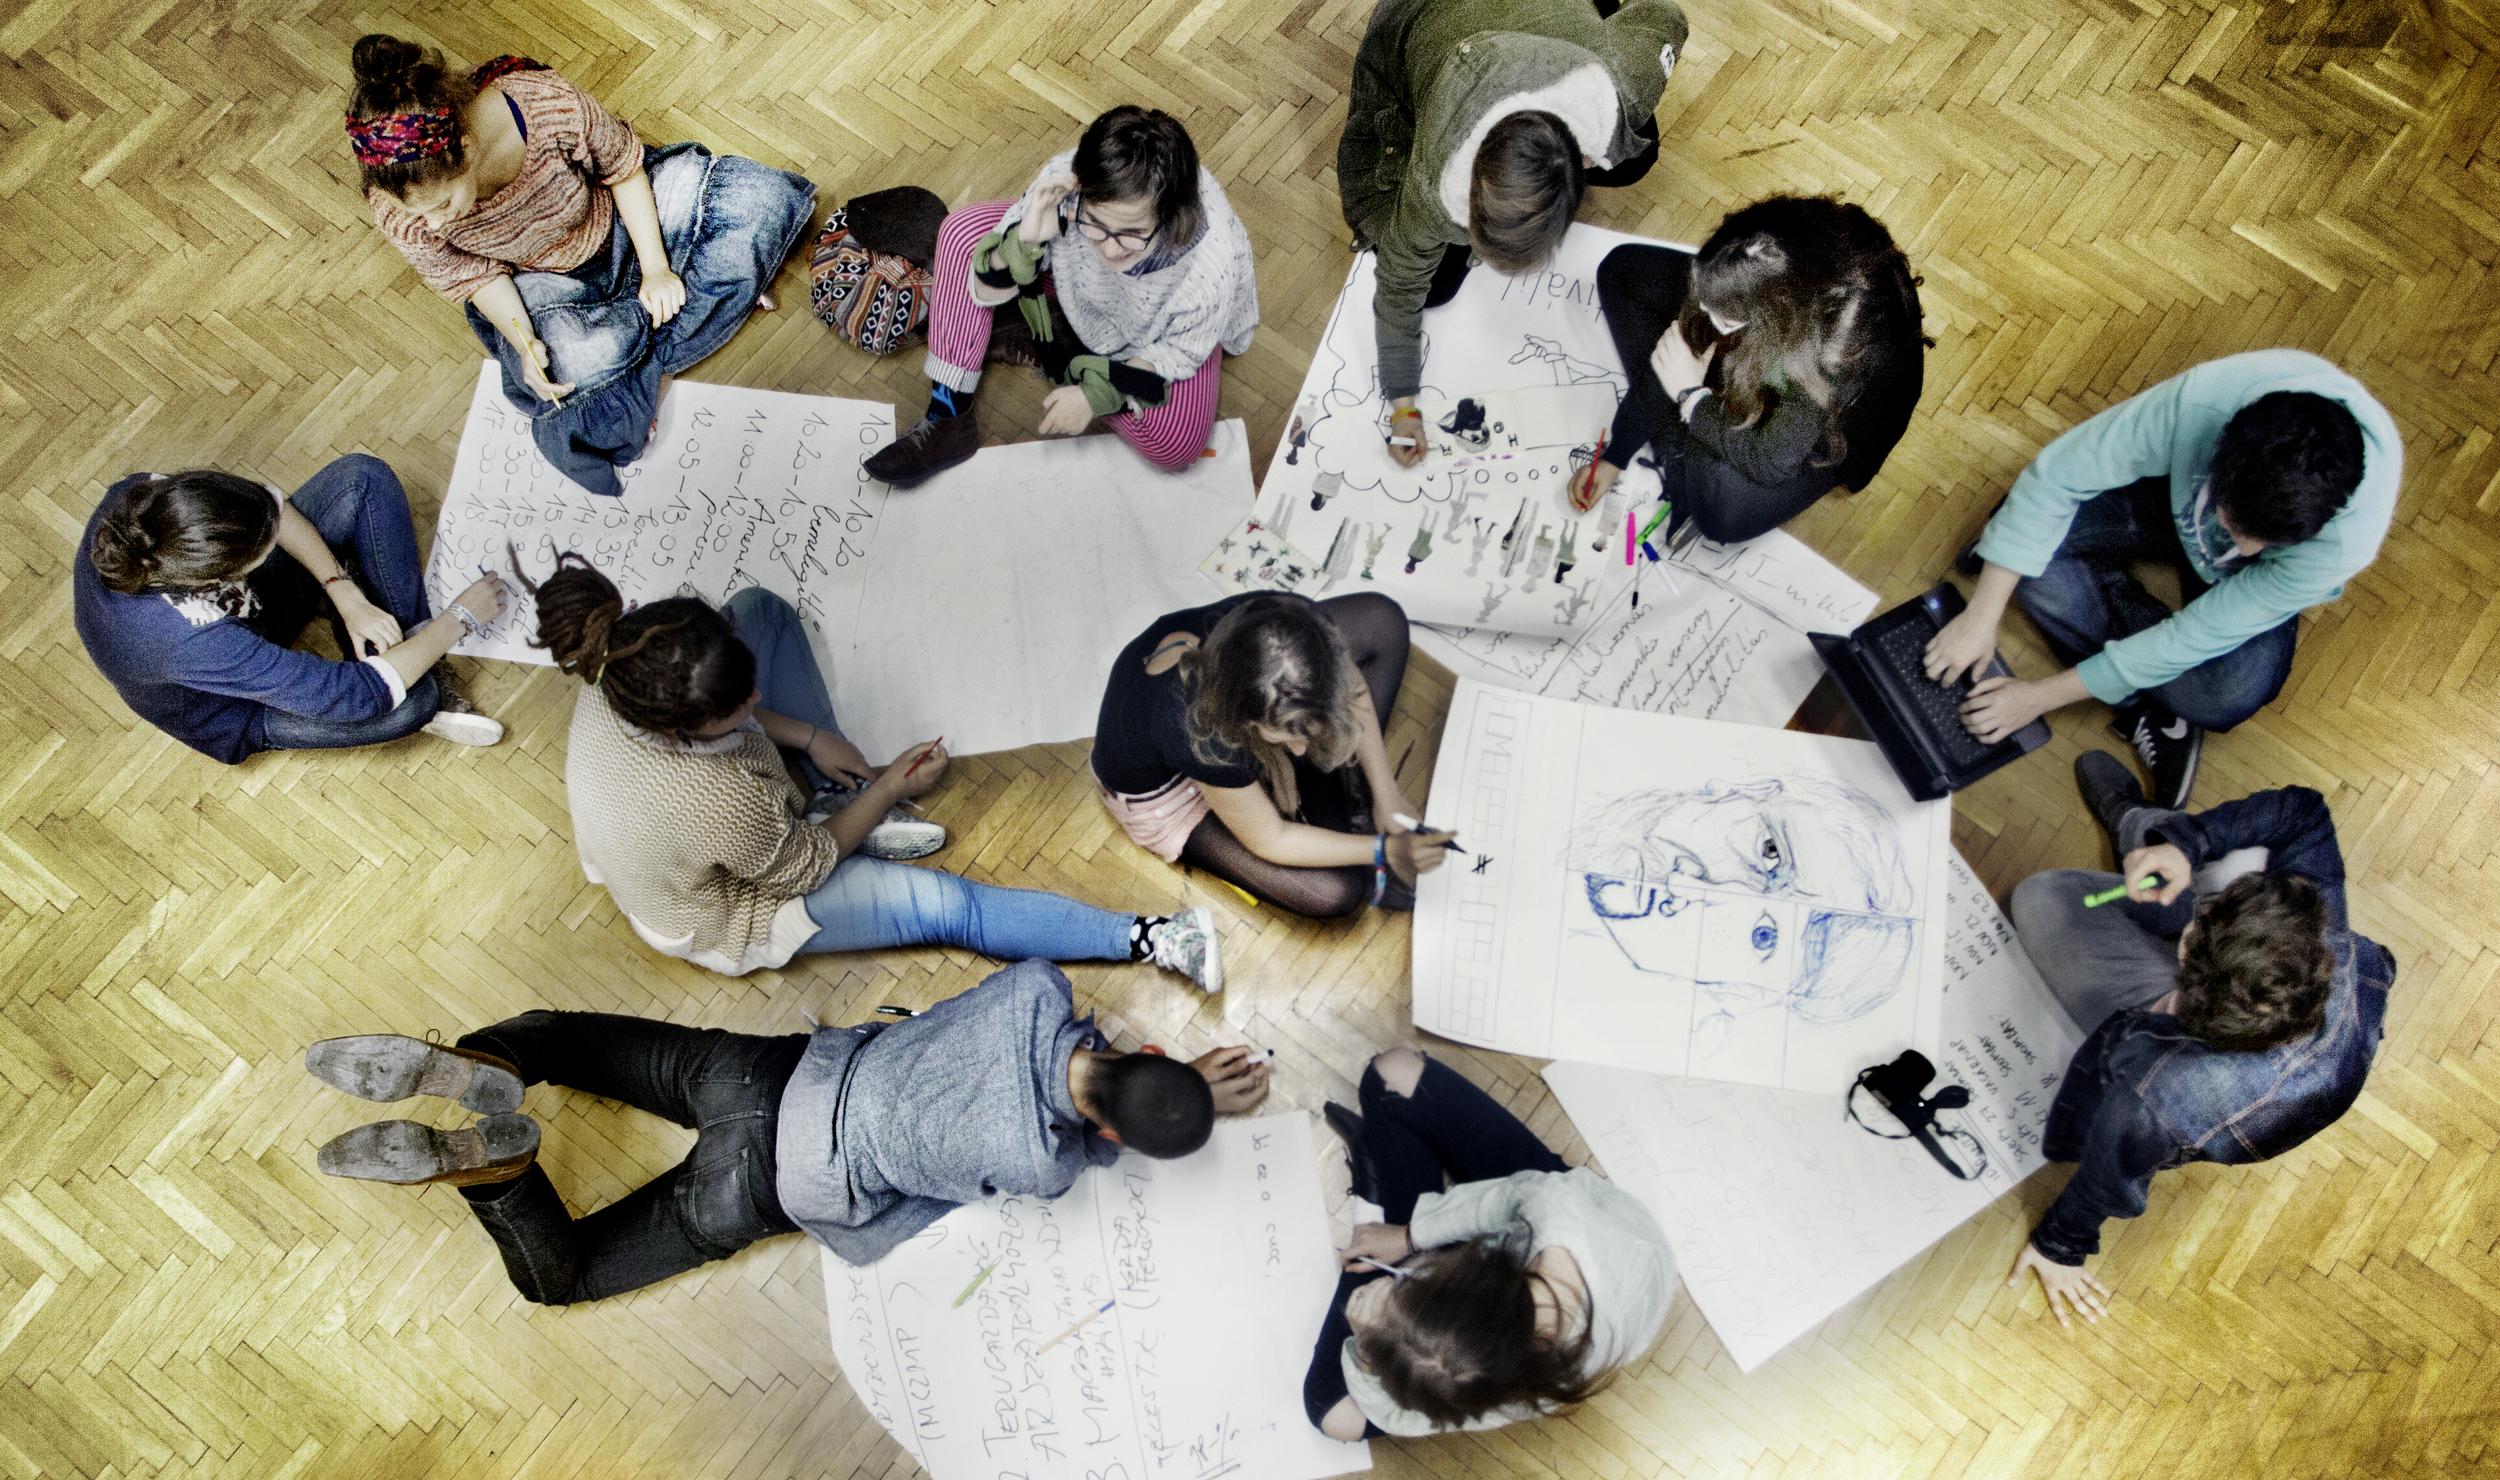 Free School Project.Photo by Máté Tóth-Ridovics